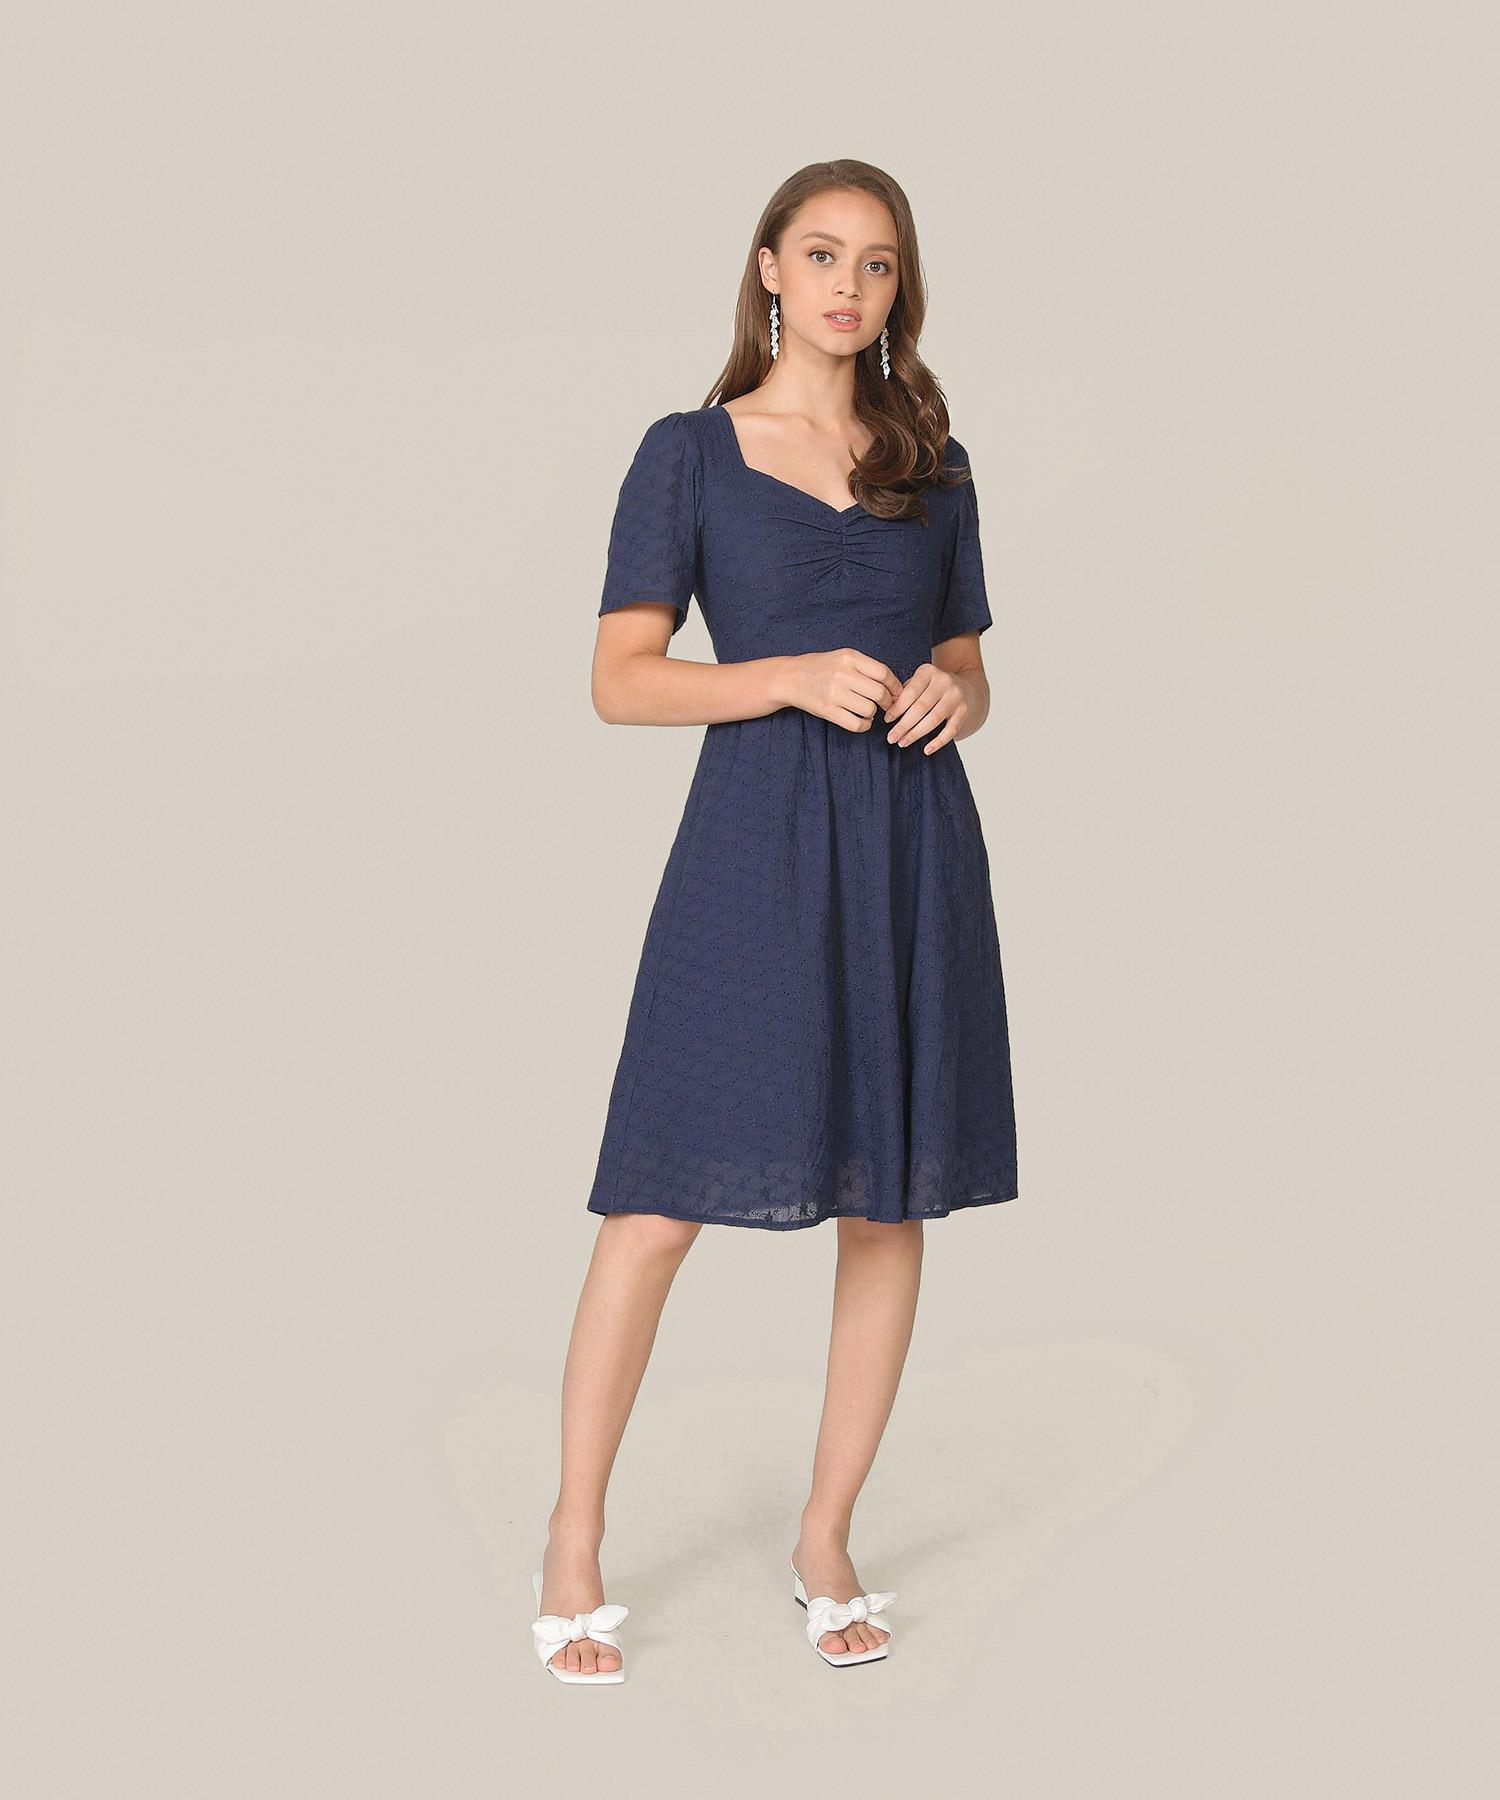 escena-embroidered-midi-dress-navy-1